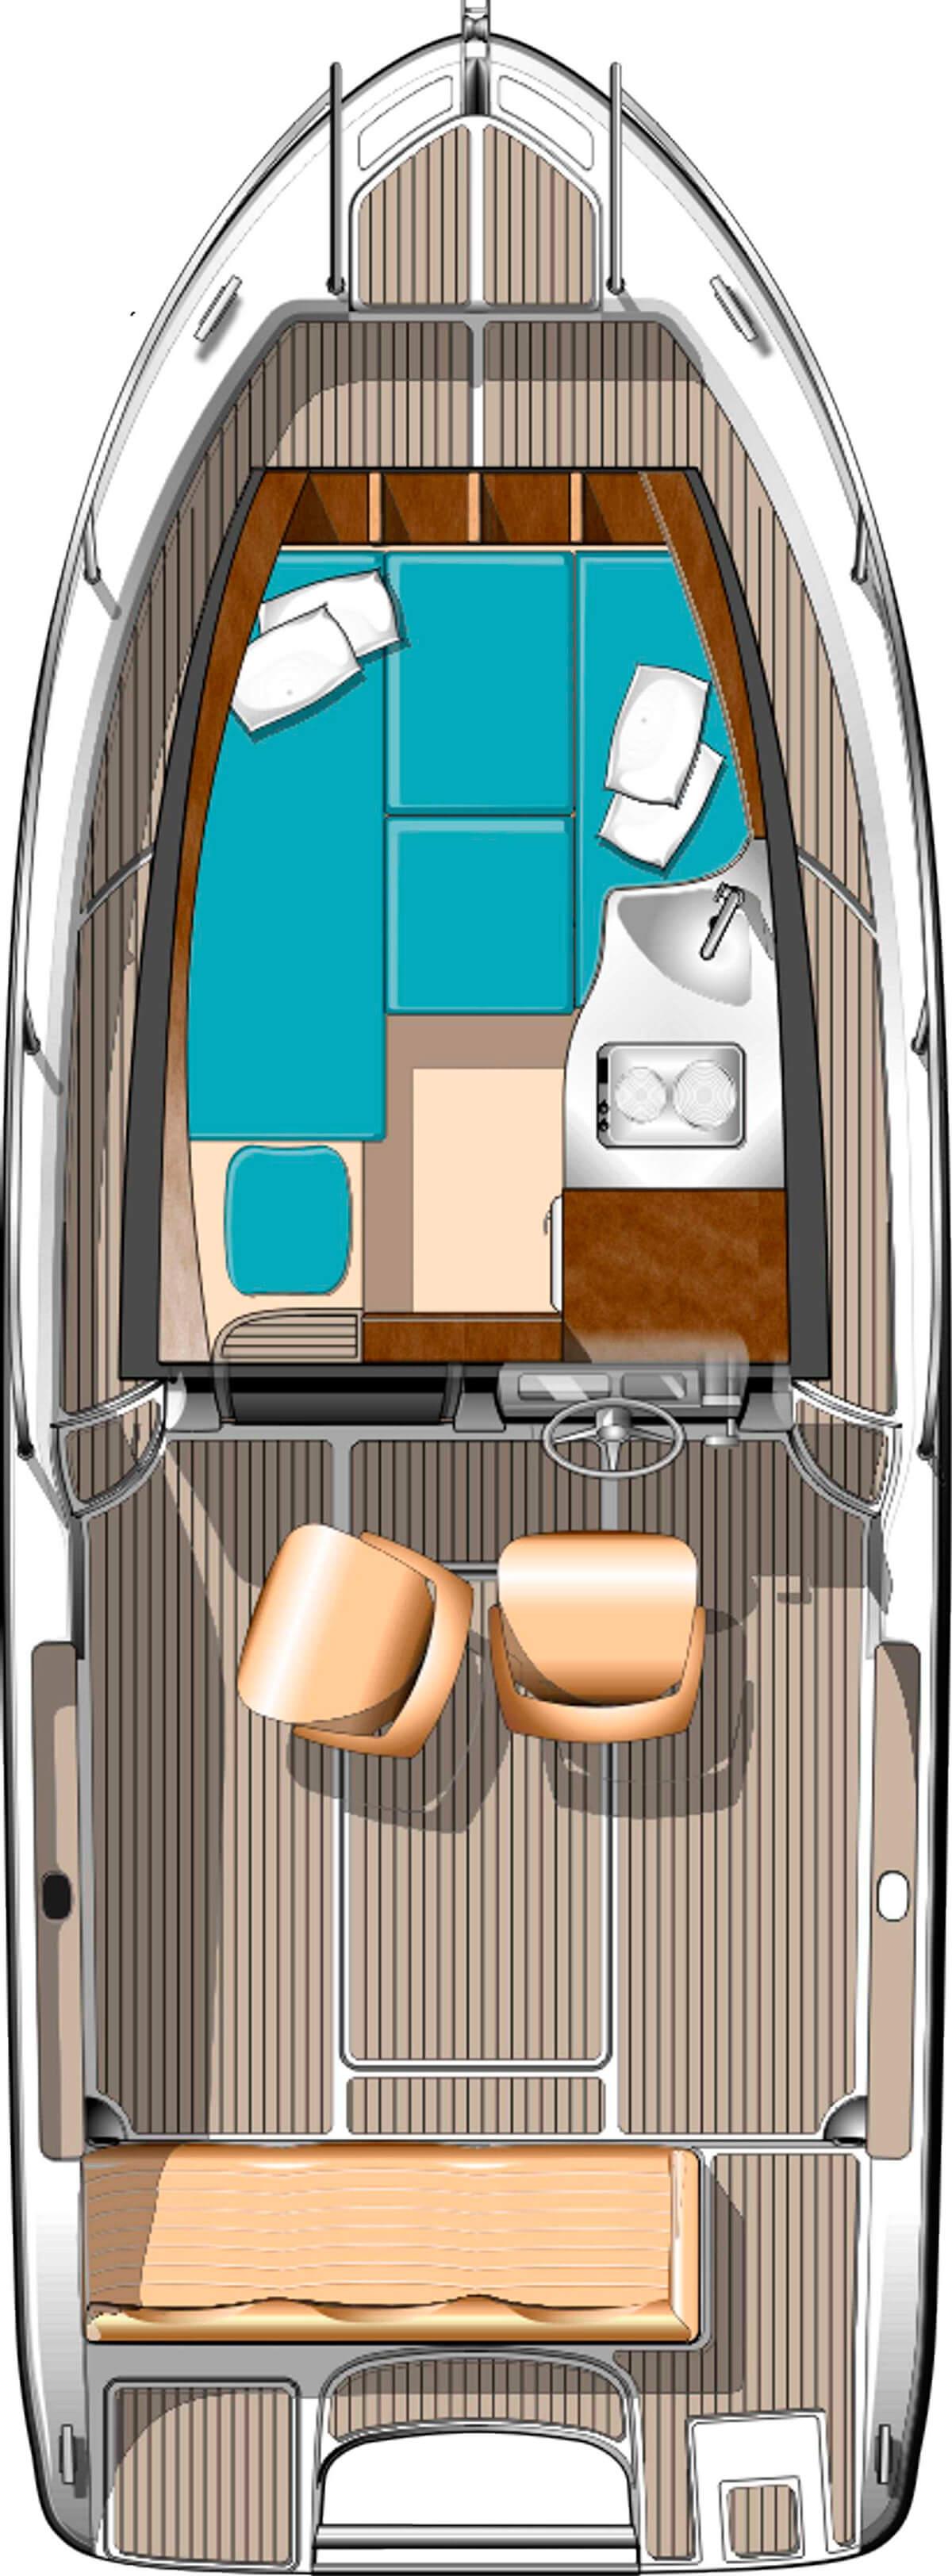 Схема катера Elan Fishingline 650 Cabin